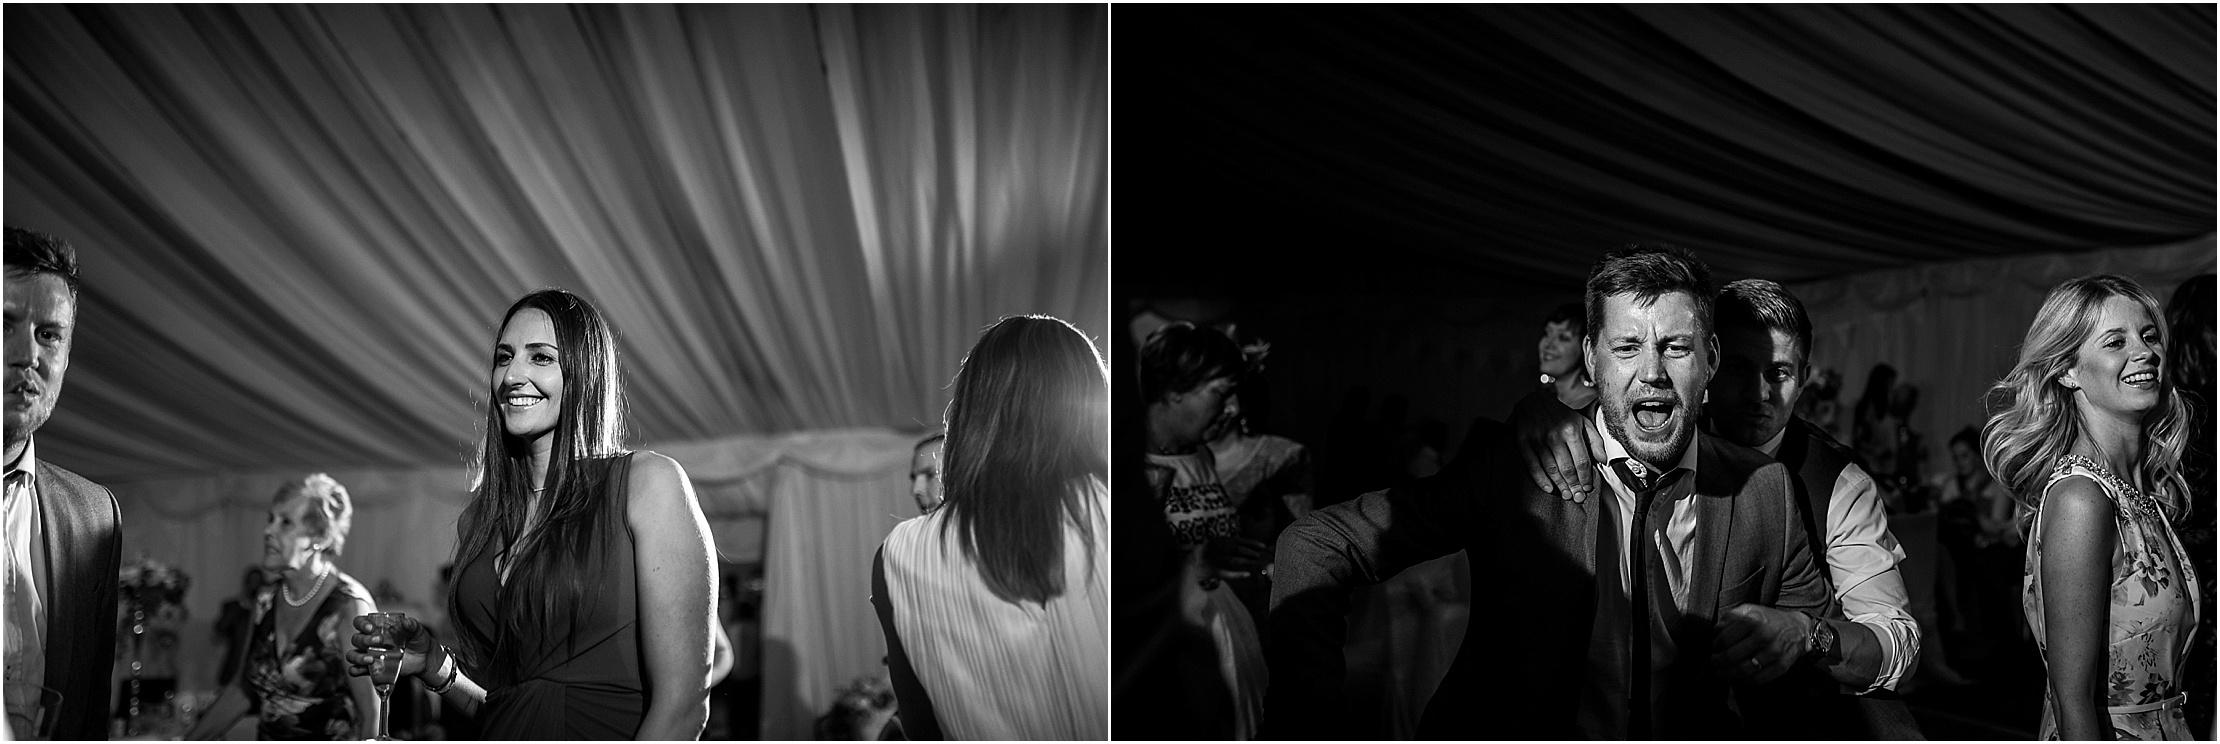 staining-lodge-wedding-123.jpg